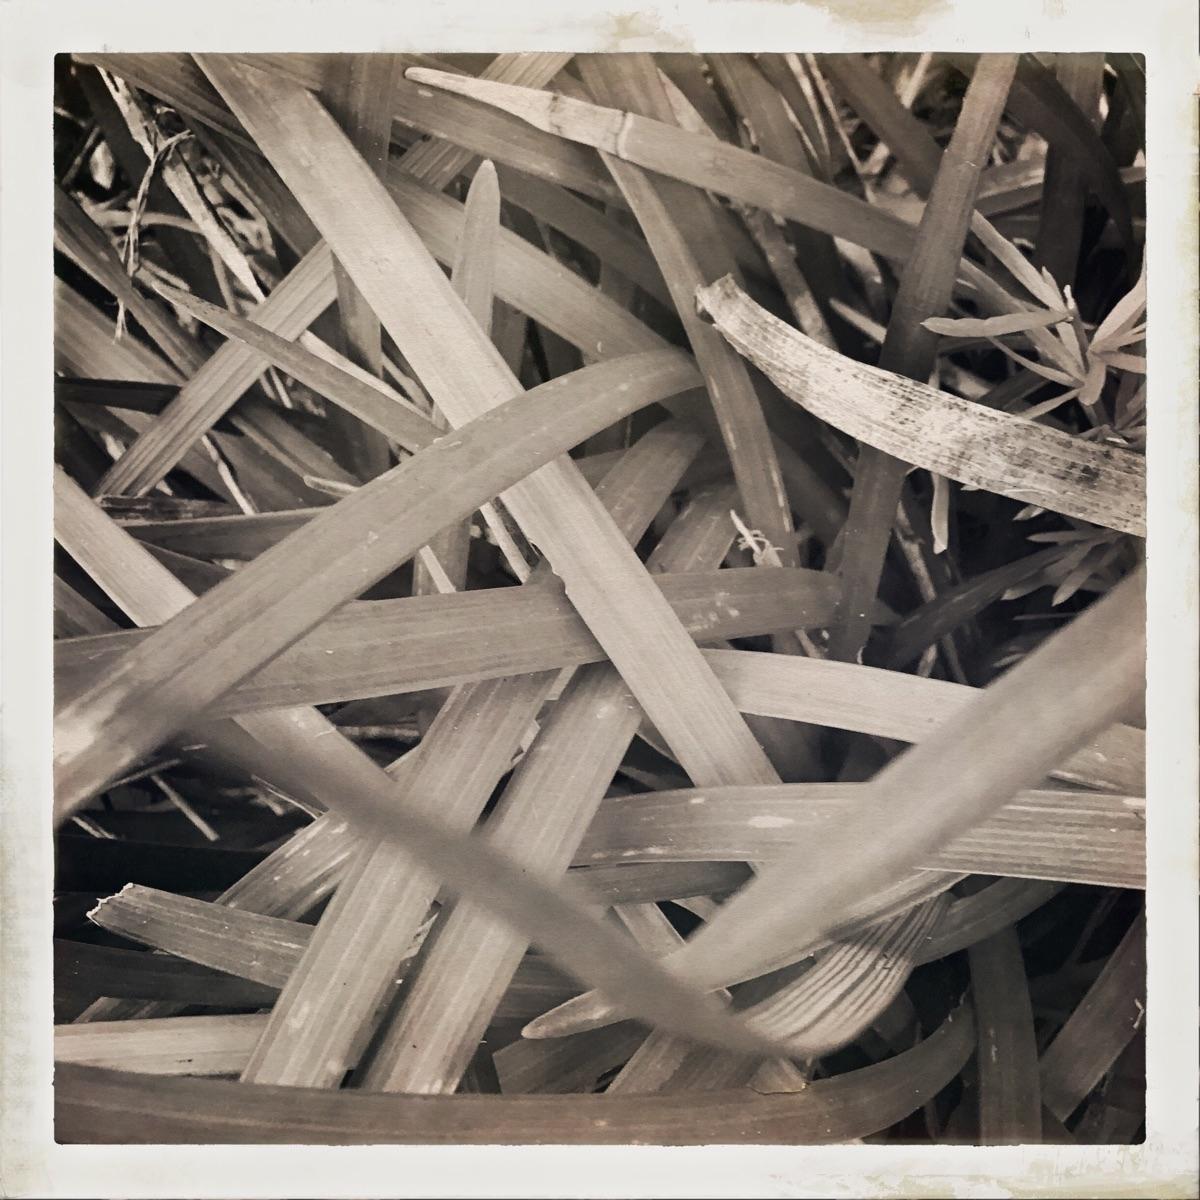 Grass blades weaving Apps - mikefl99 - mikefl99 | ello